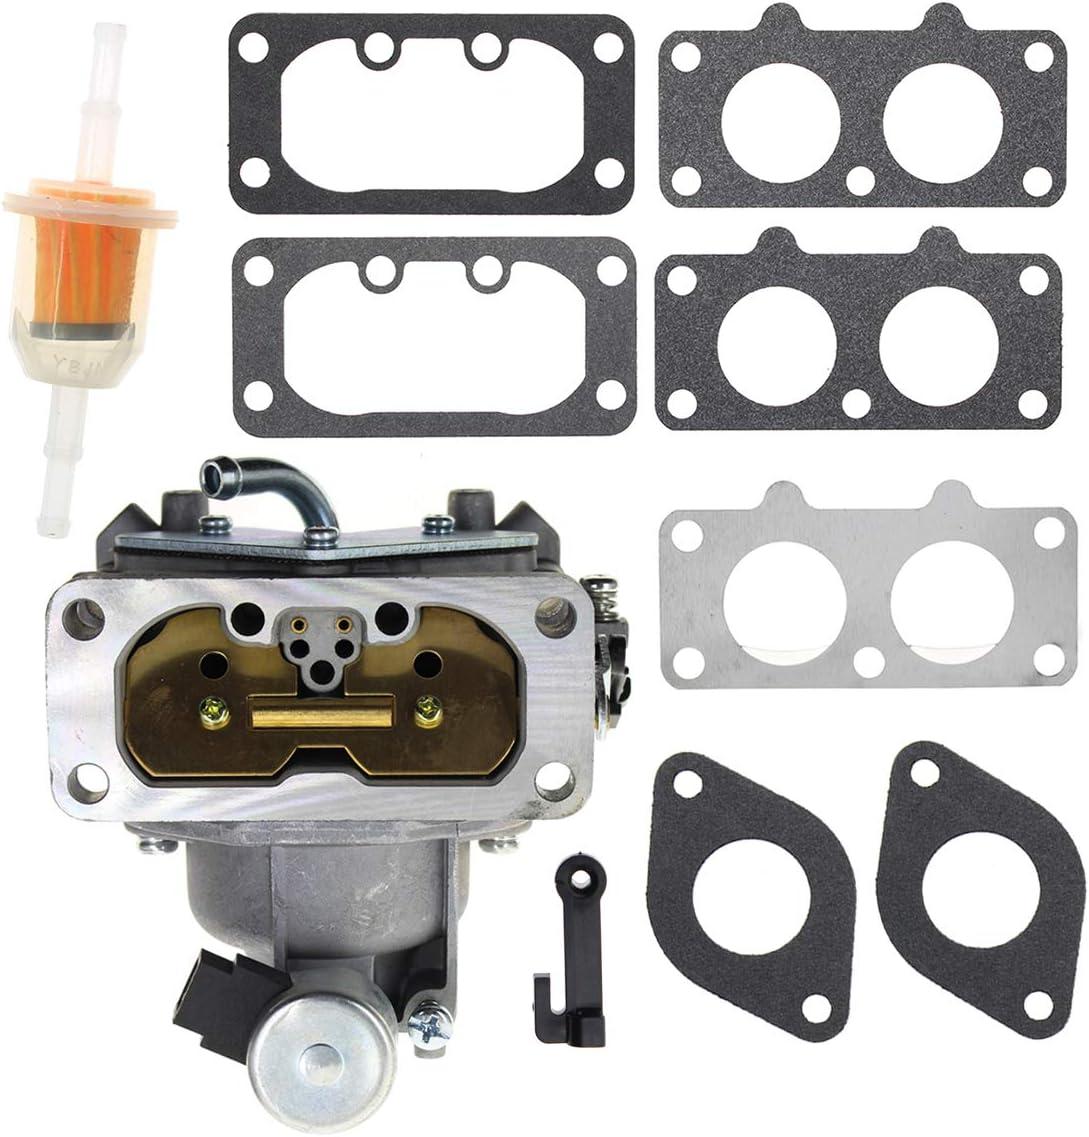 Carbhub Carburetor for Kawasaki some FH641V, FH661V Replaces 15004-0763, 15004-7024, 15004-1010